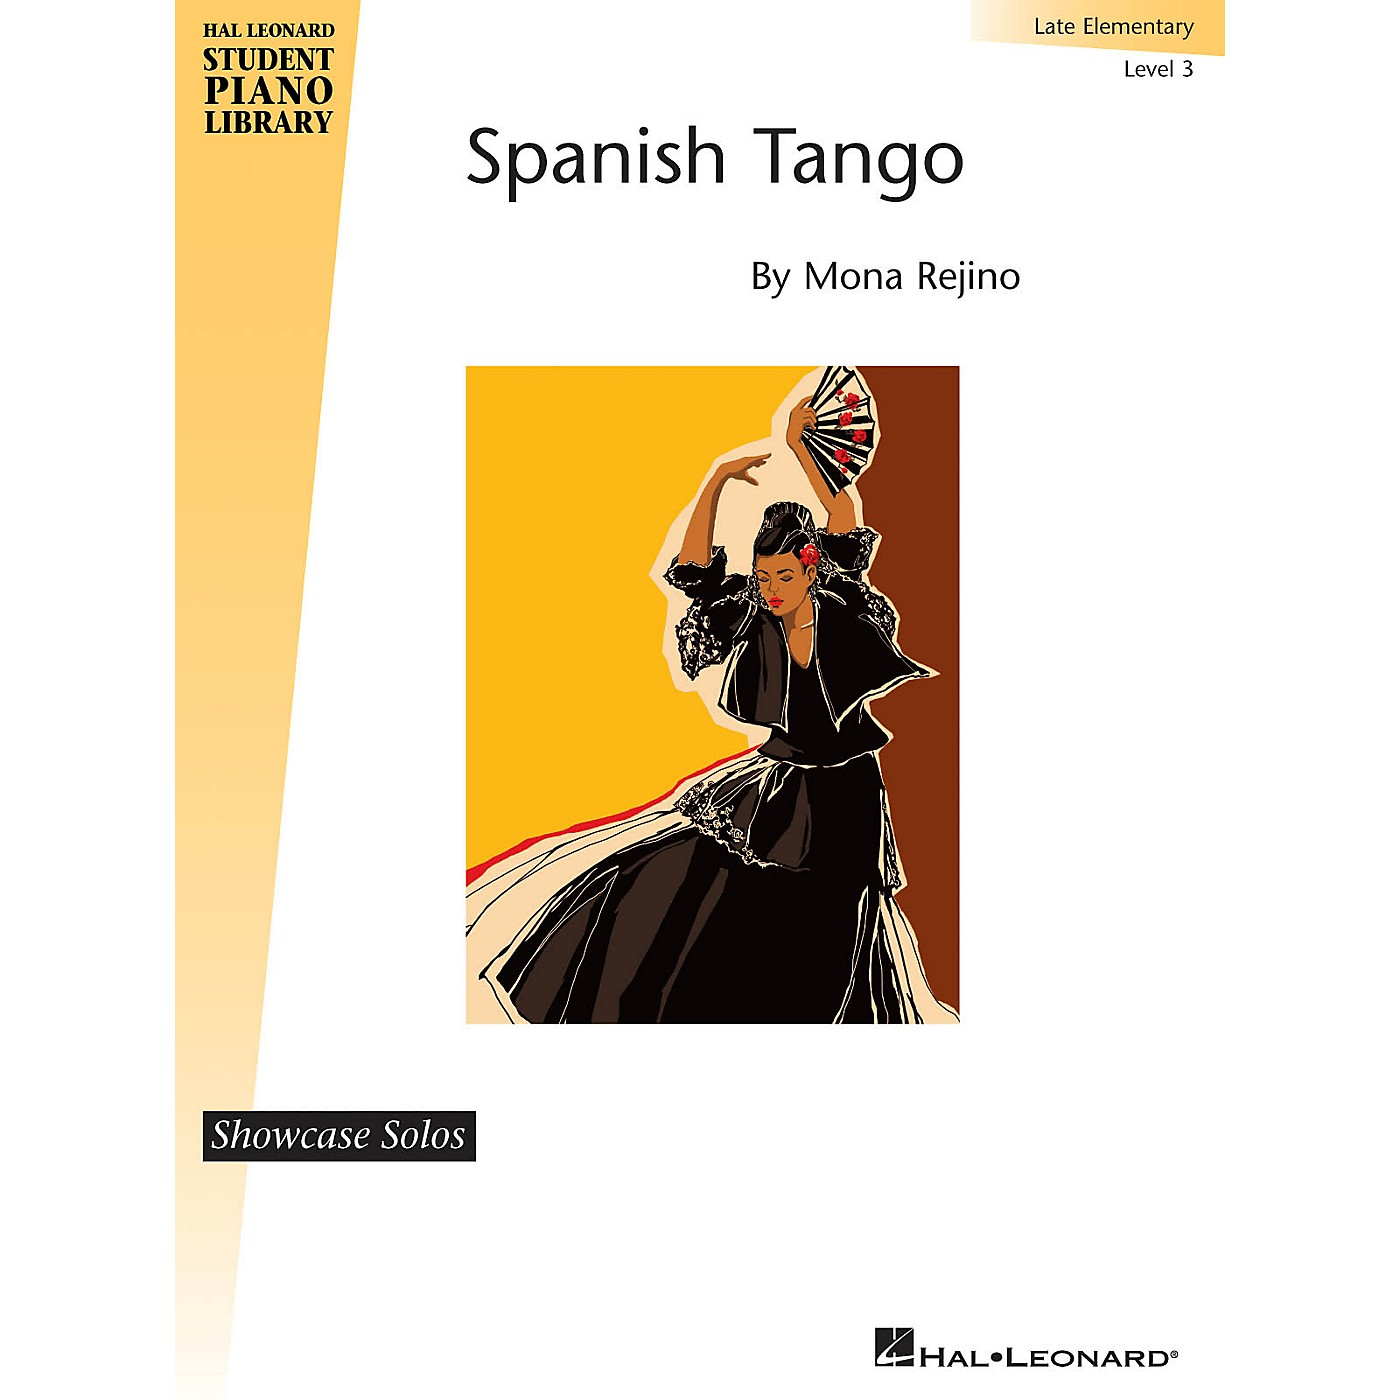 Hal Leonard Spanish Tango Piano Library Series by Mona Rejino (Level Late Elem) thumbnail